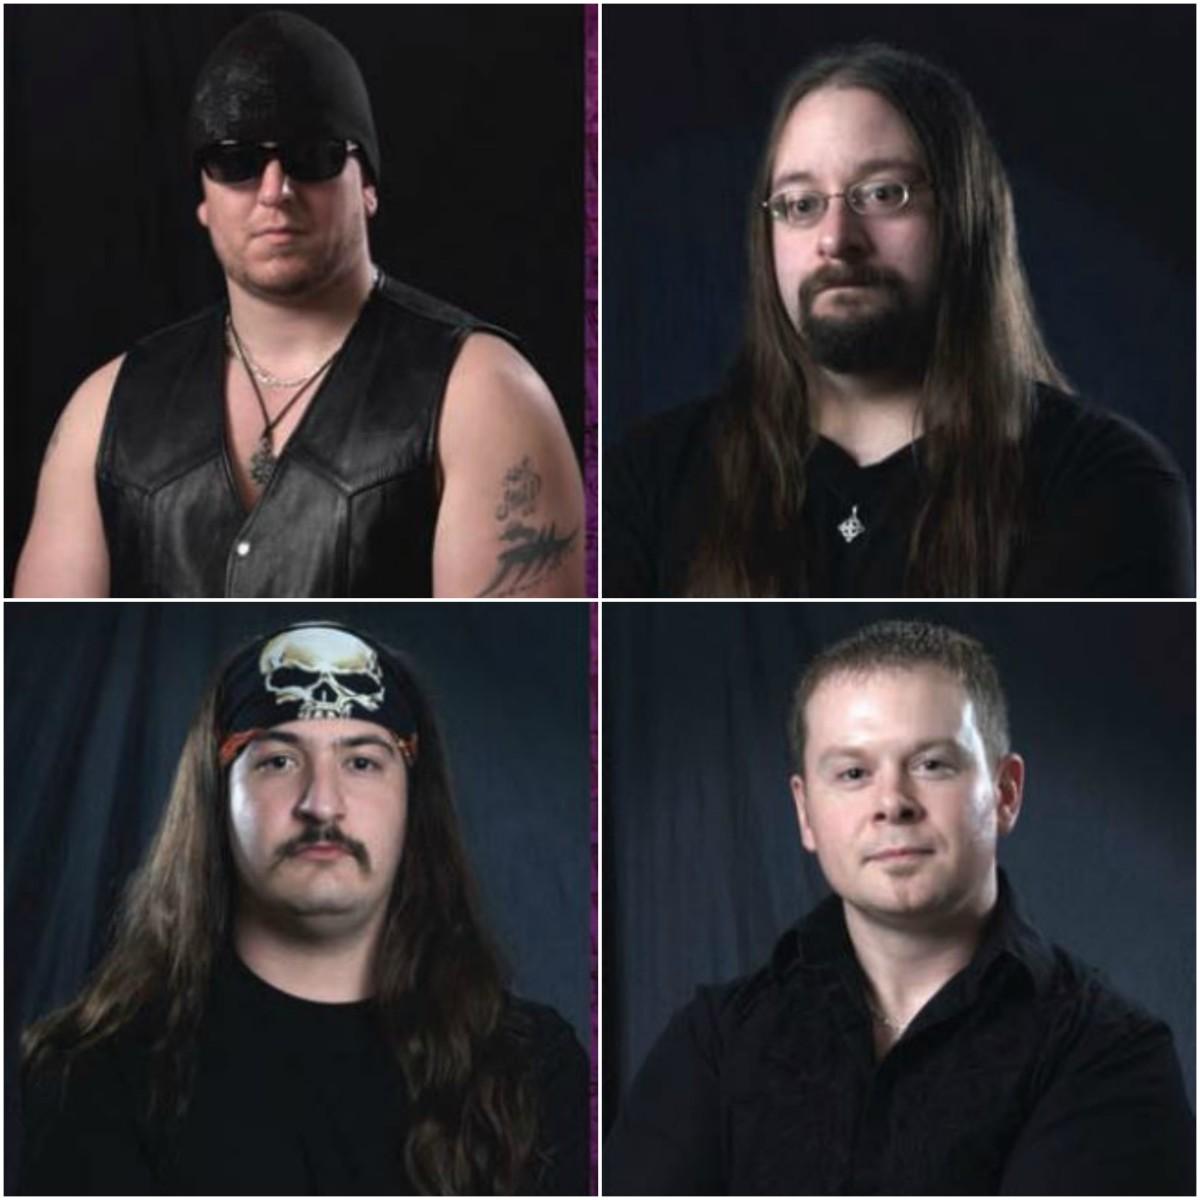 Top L-R: Joel Wood (vocals), Chuck Donahue (bass) Bottom L-R: John Jesuele (drums), Mike Johnson (guitar)